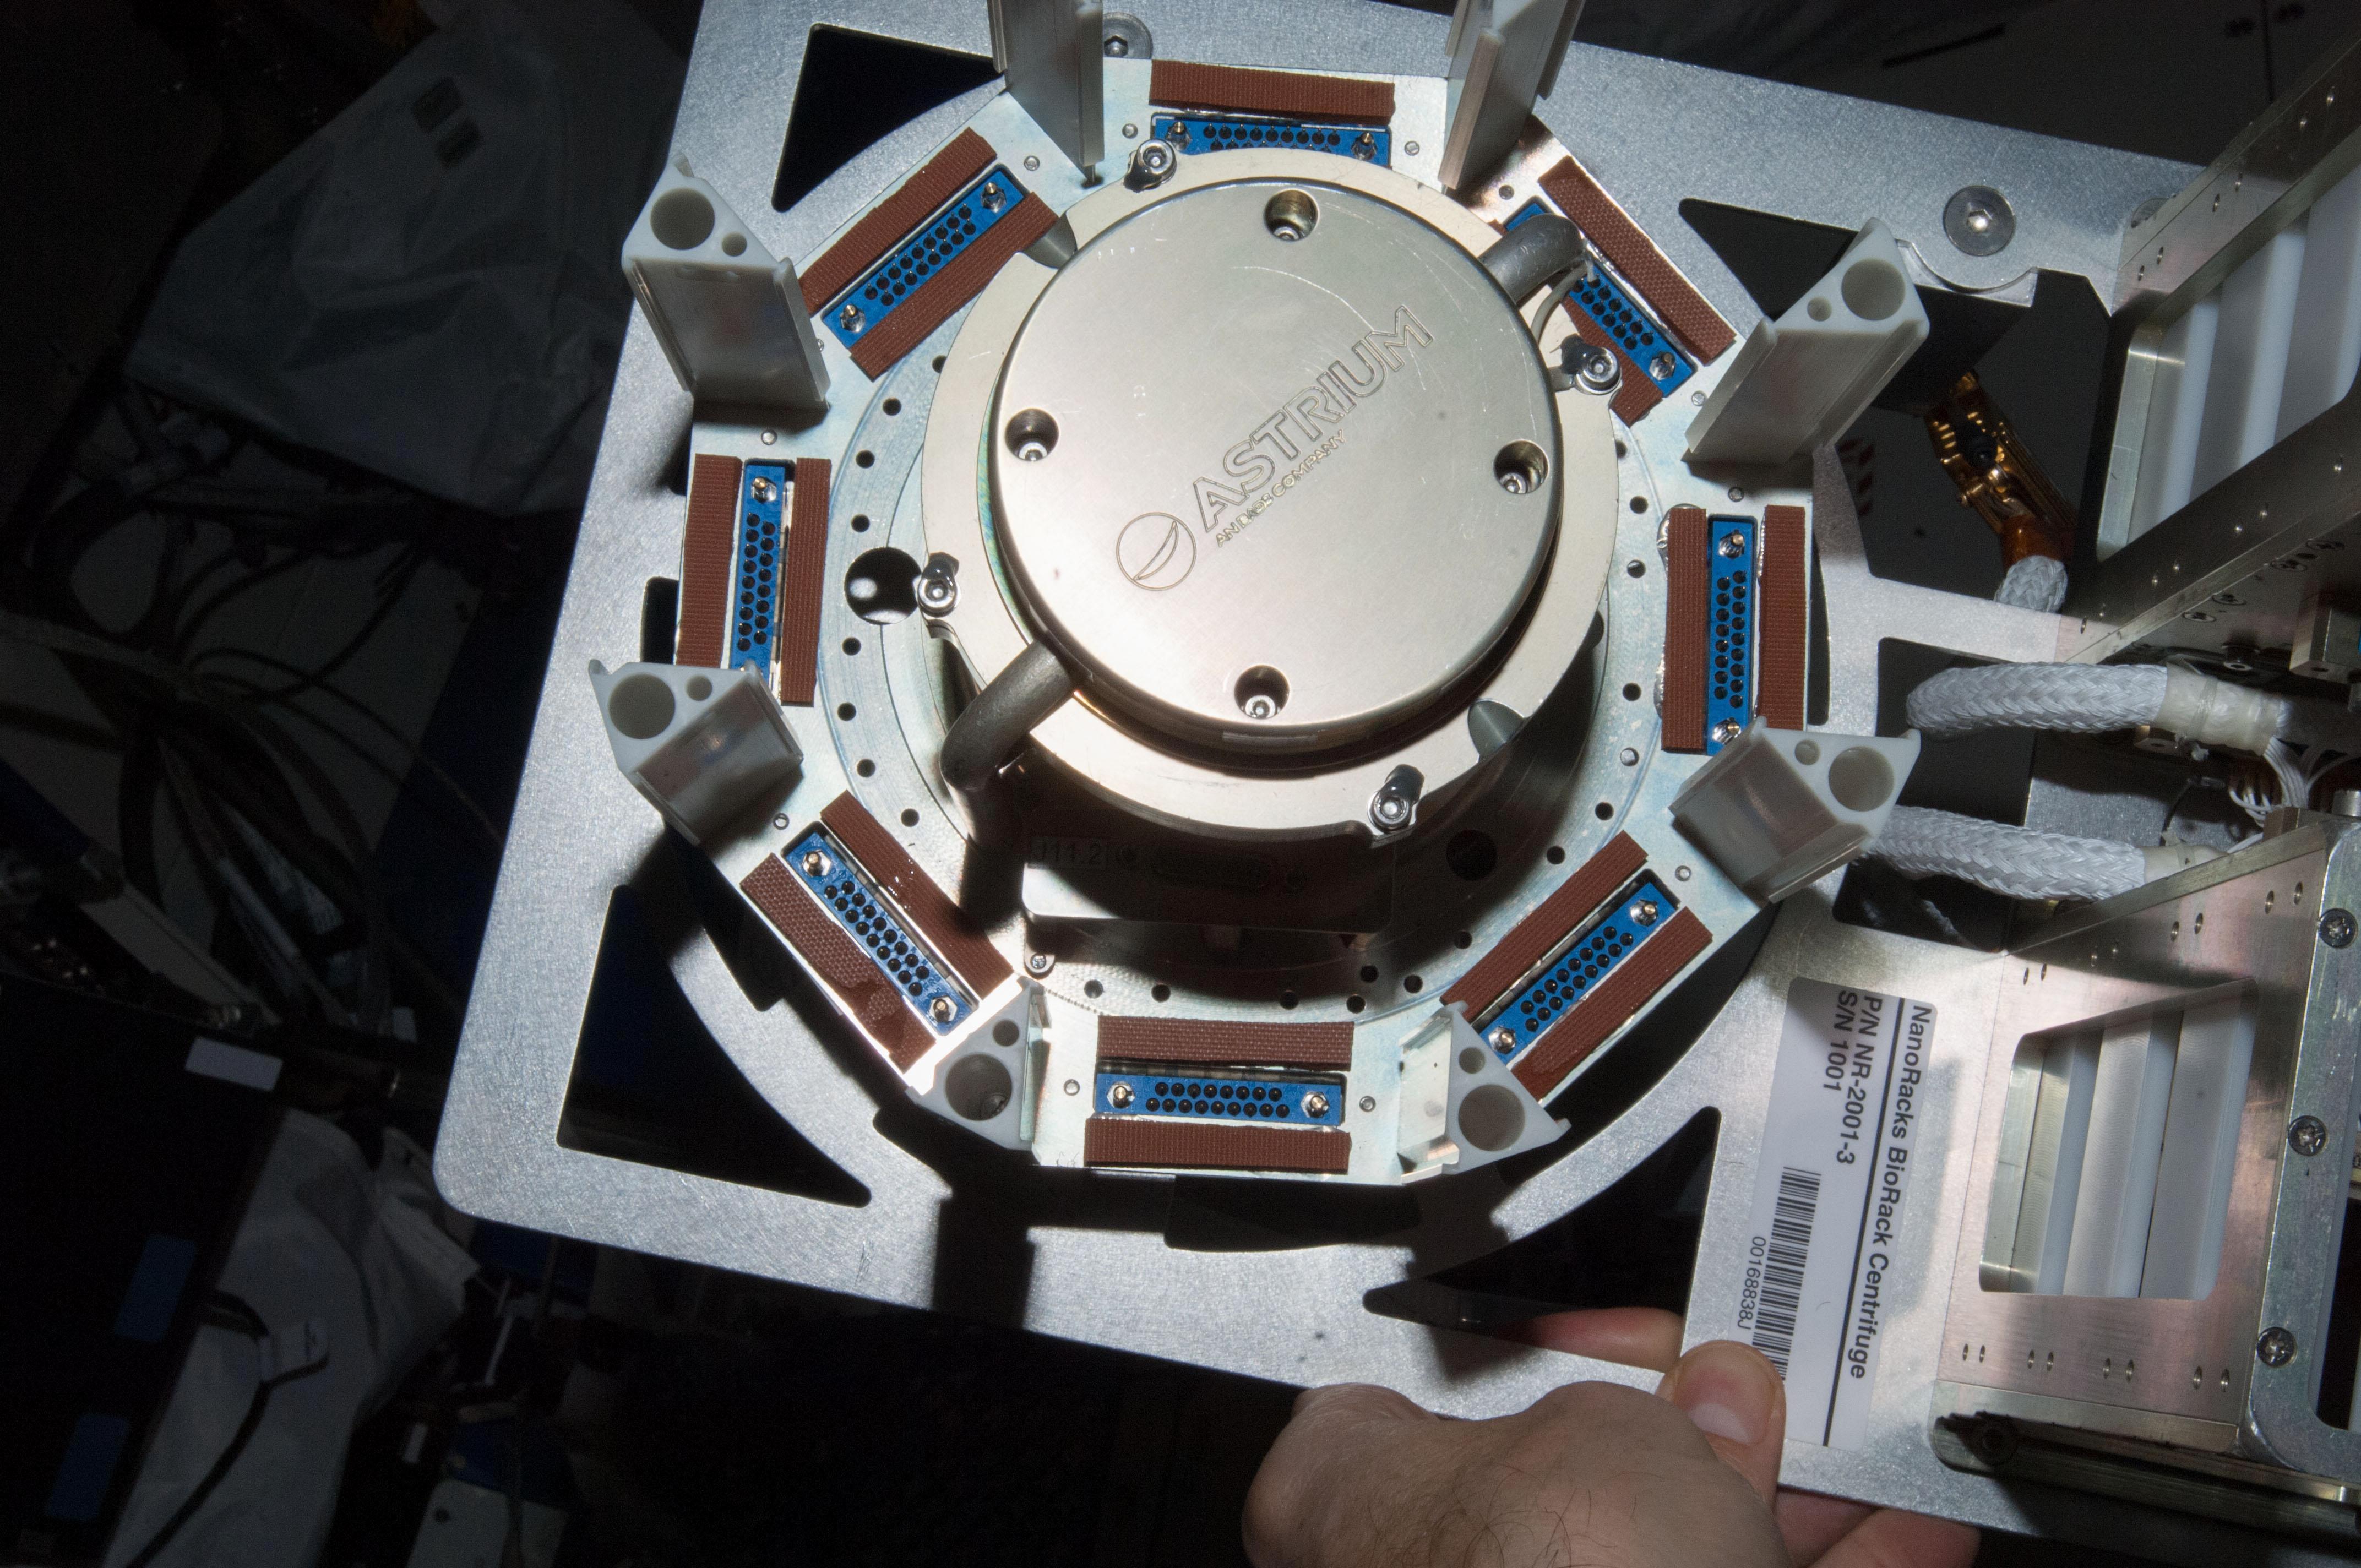 centrifuge nasa - photo #46